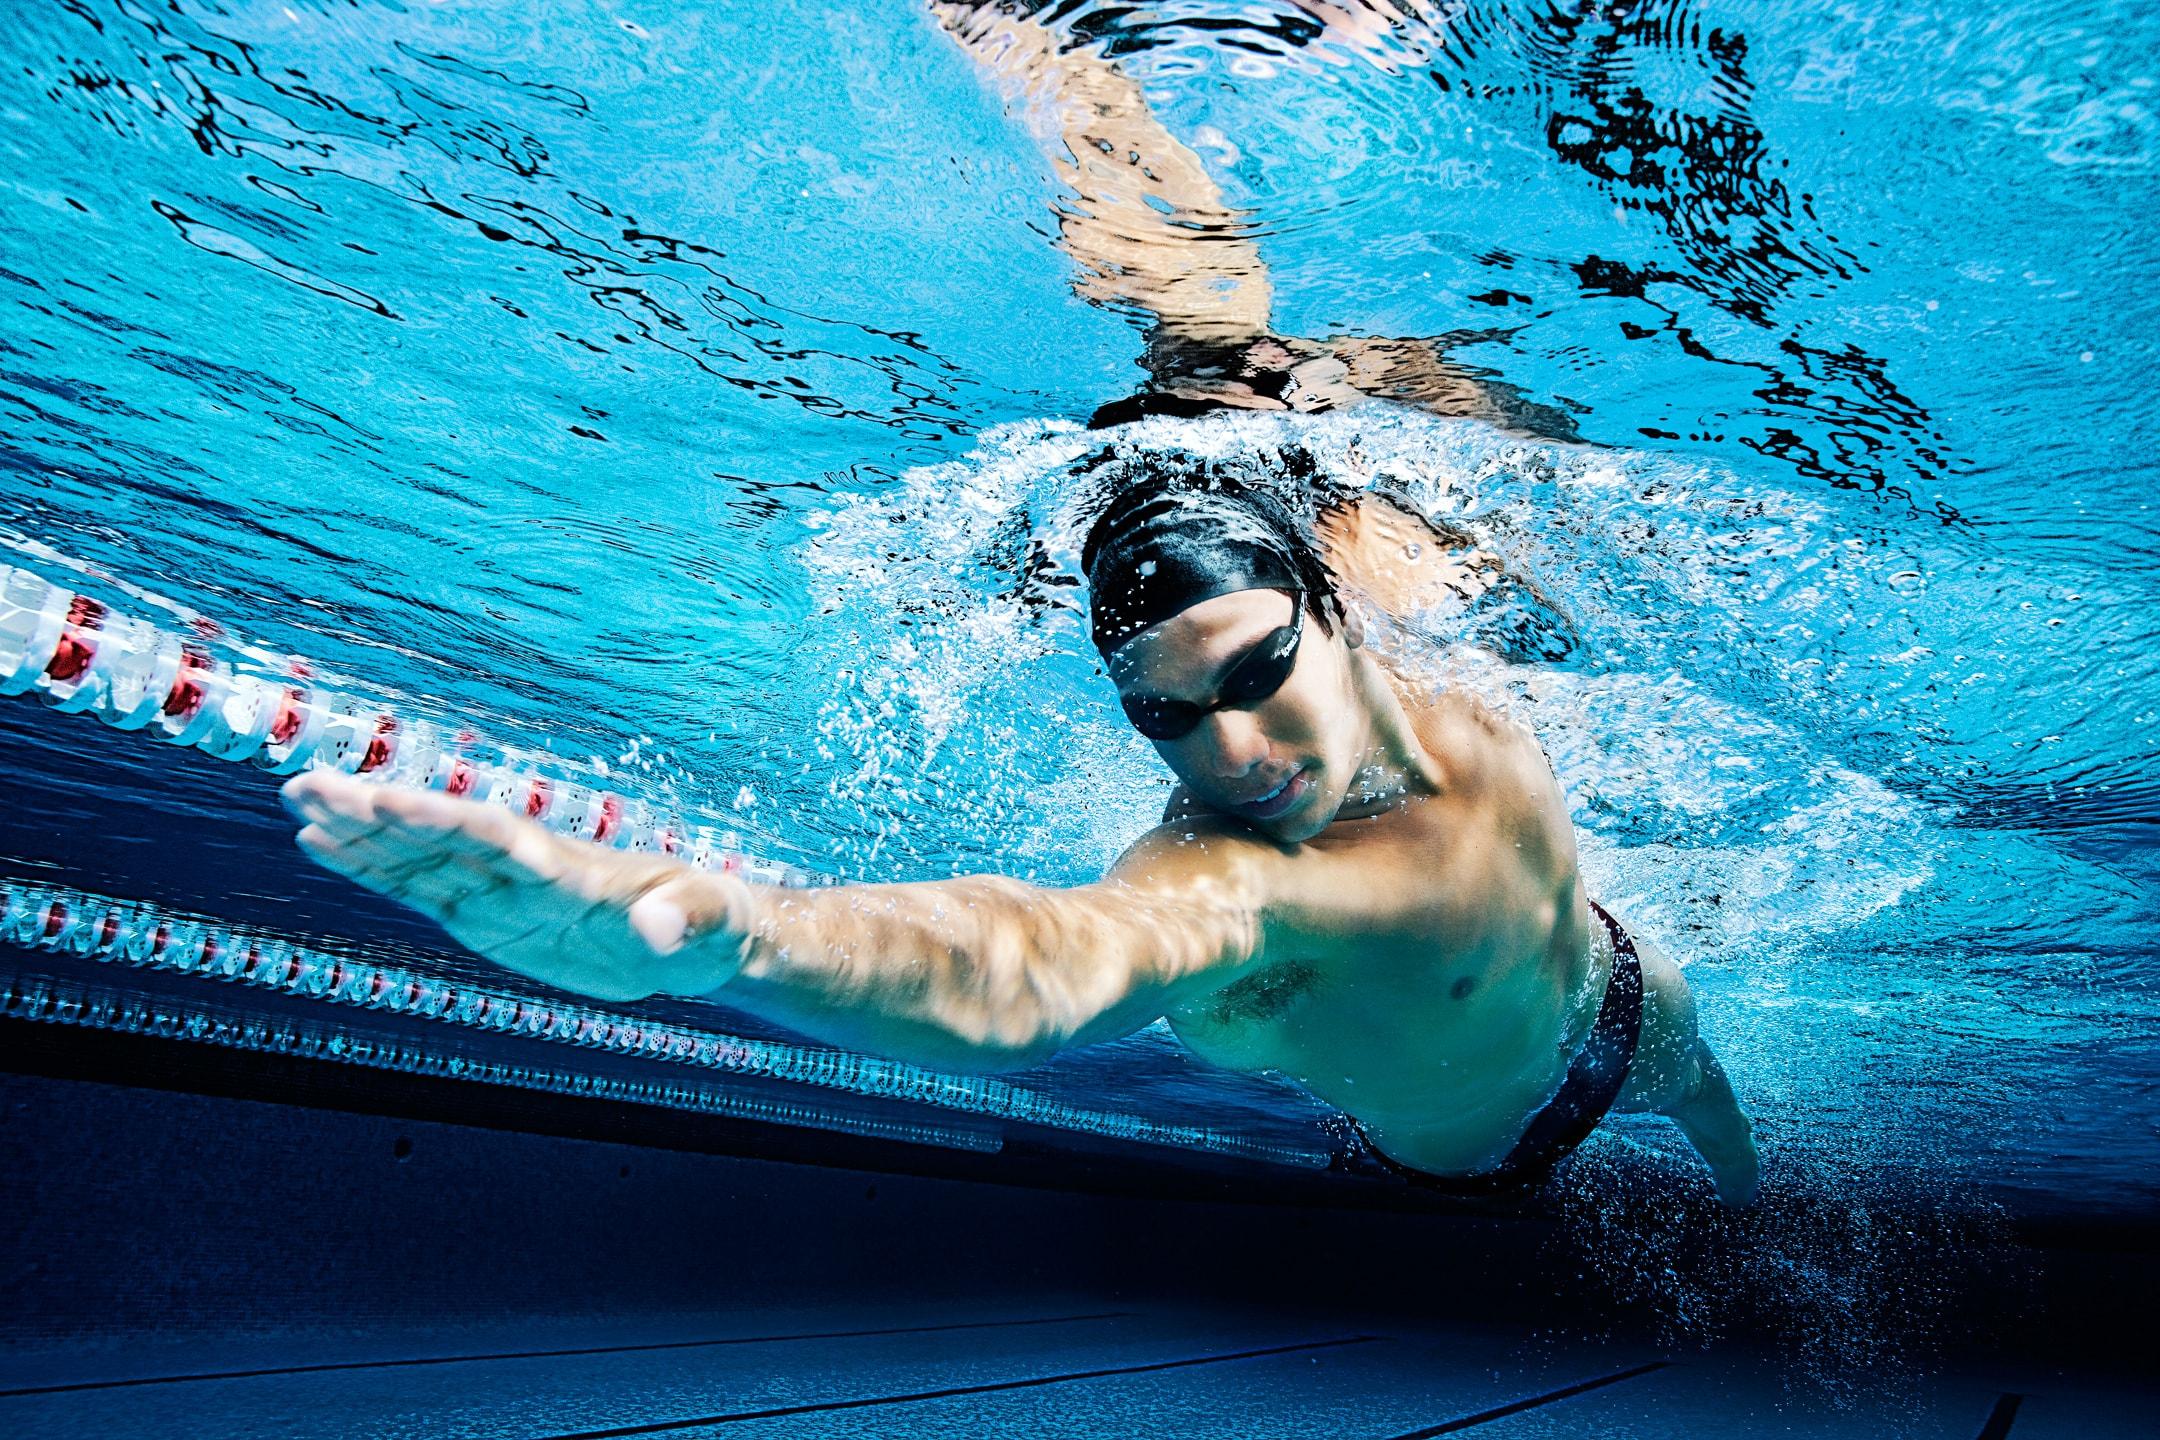 swimming-sports-photography-miami-marcel-boldu.jpg